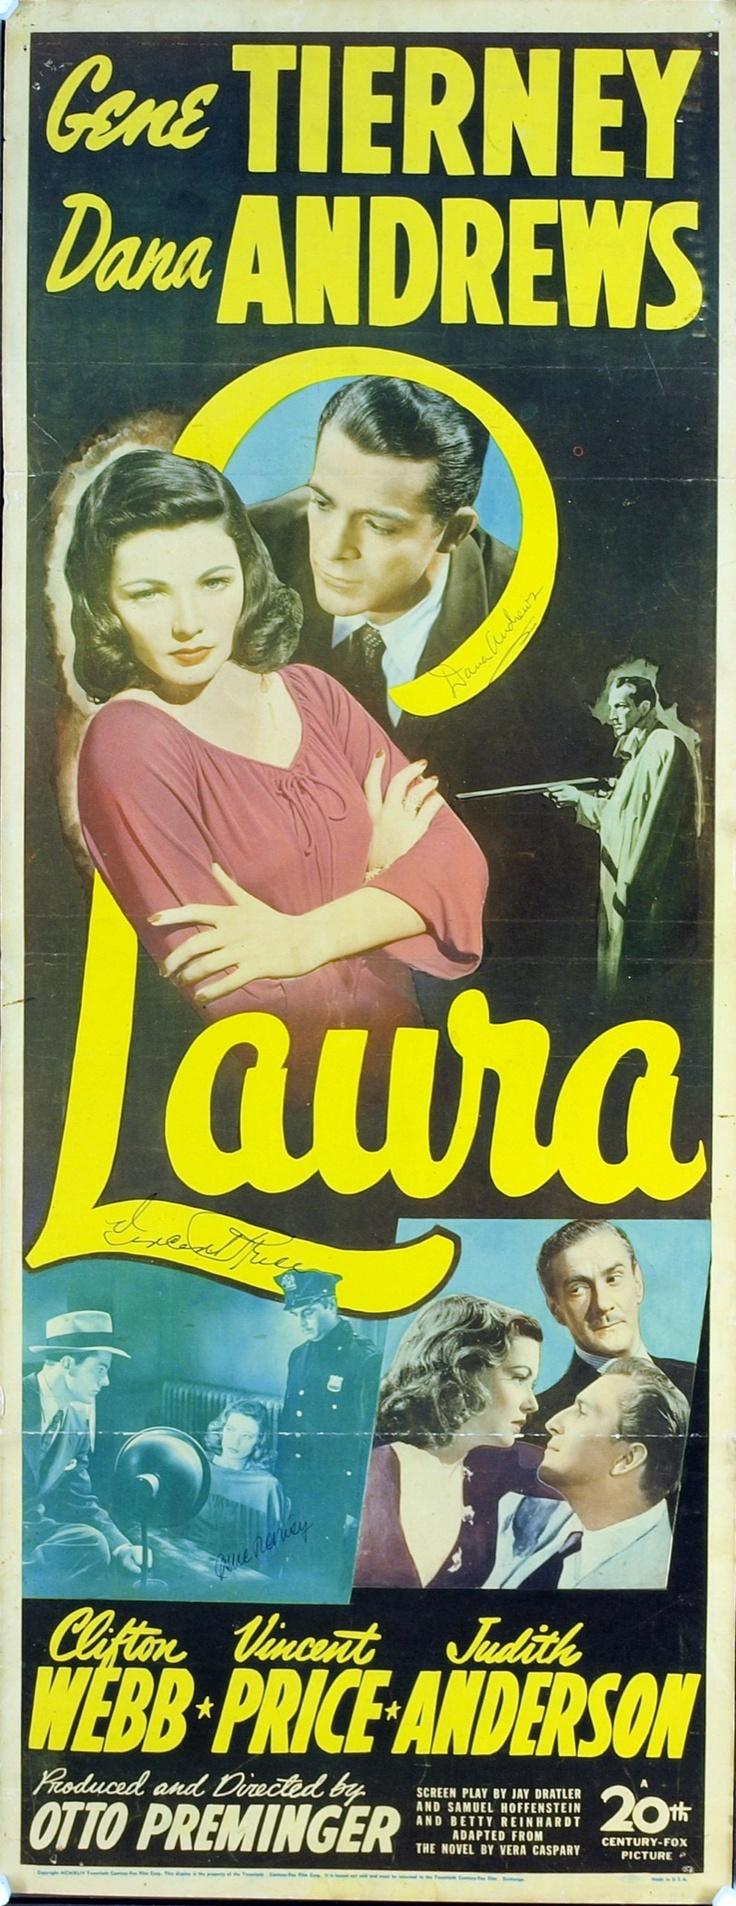 Laura -1944 http://www.tcm.com/tcmdb/title/81004/Laura/